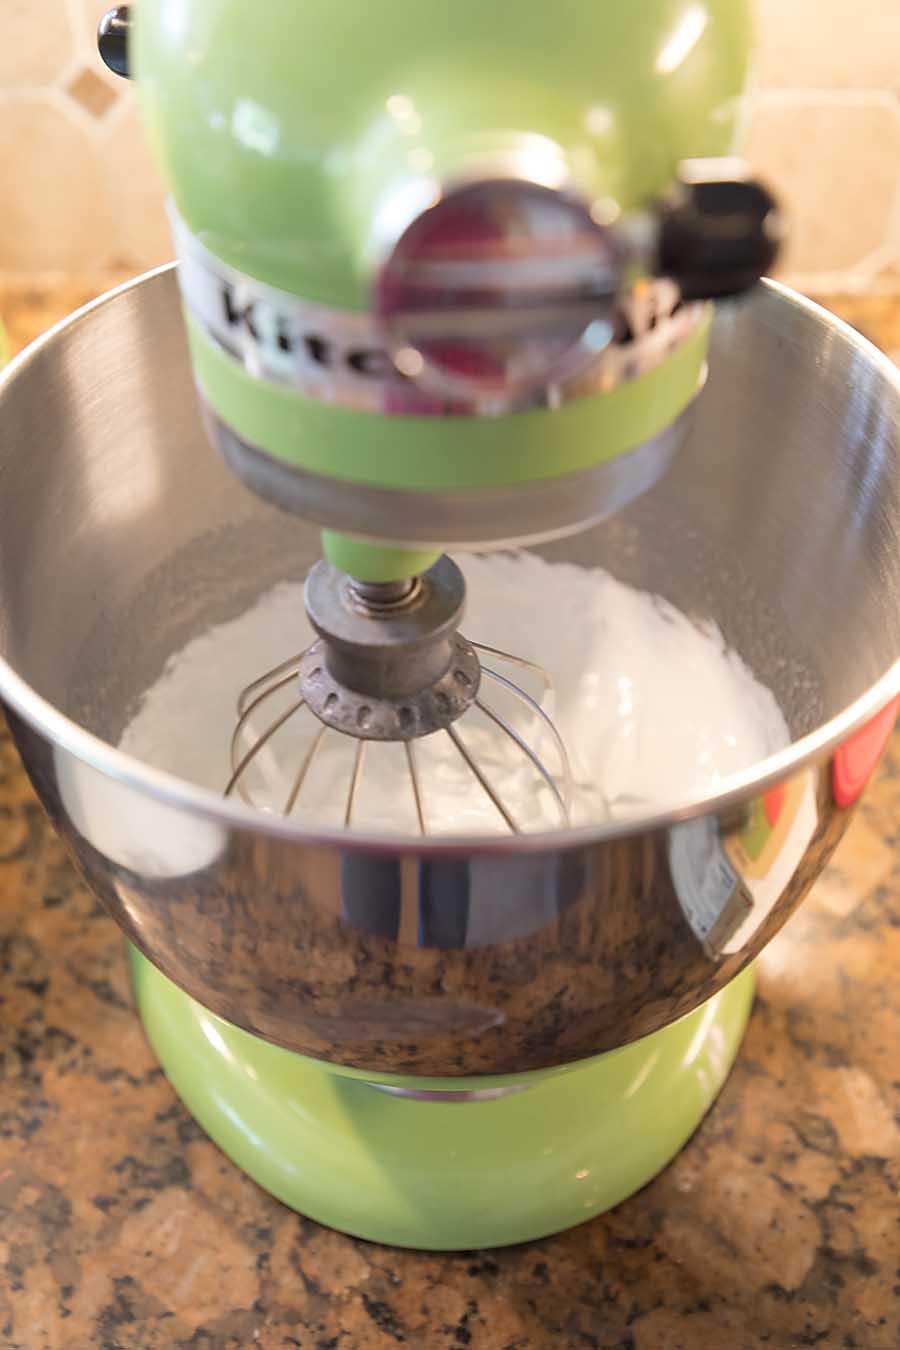 Making Swiss Meringue Buttercream